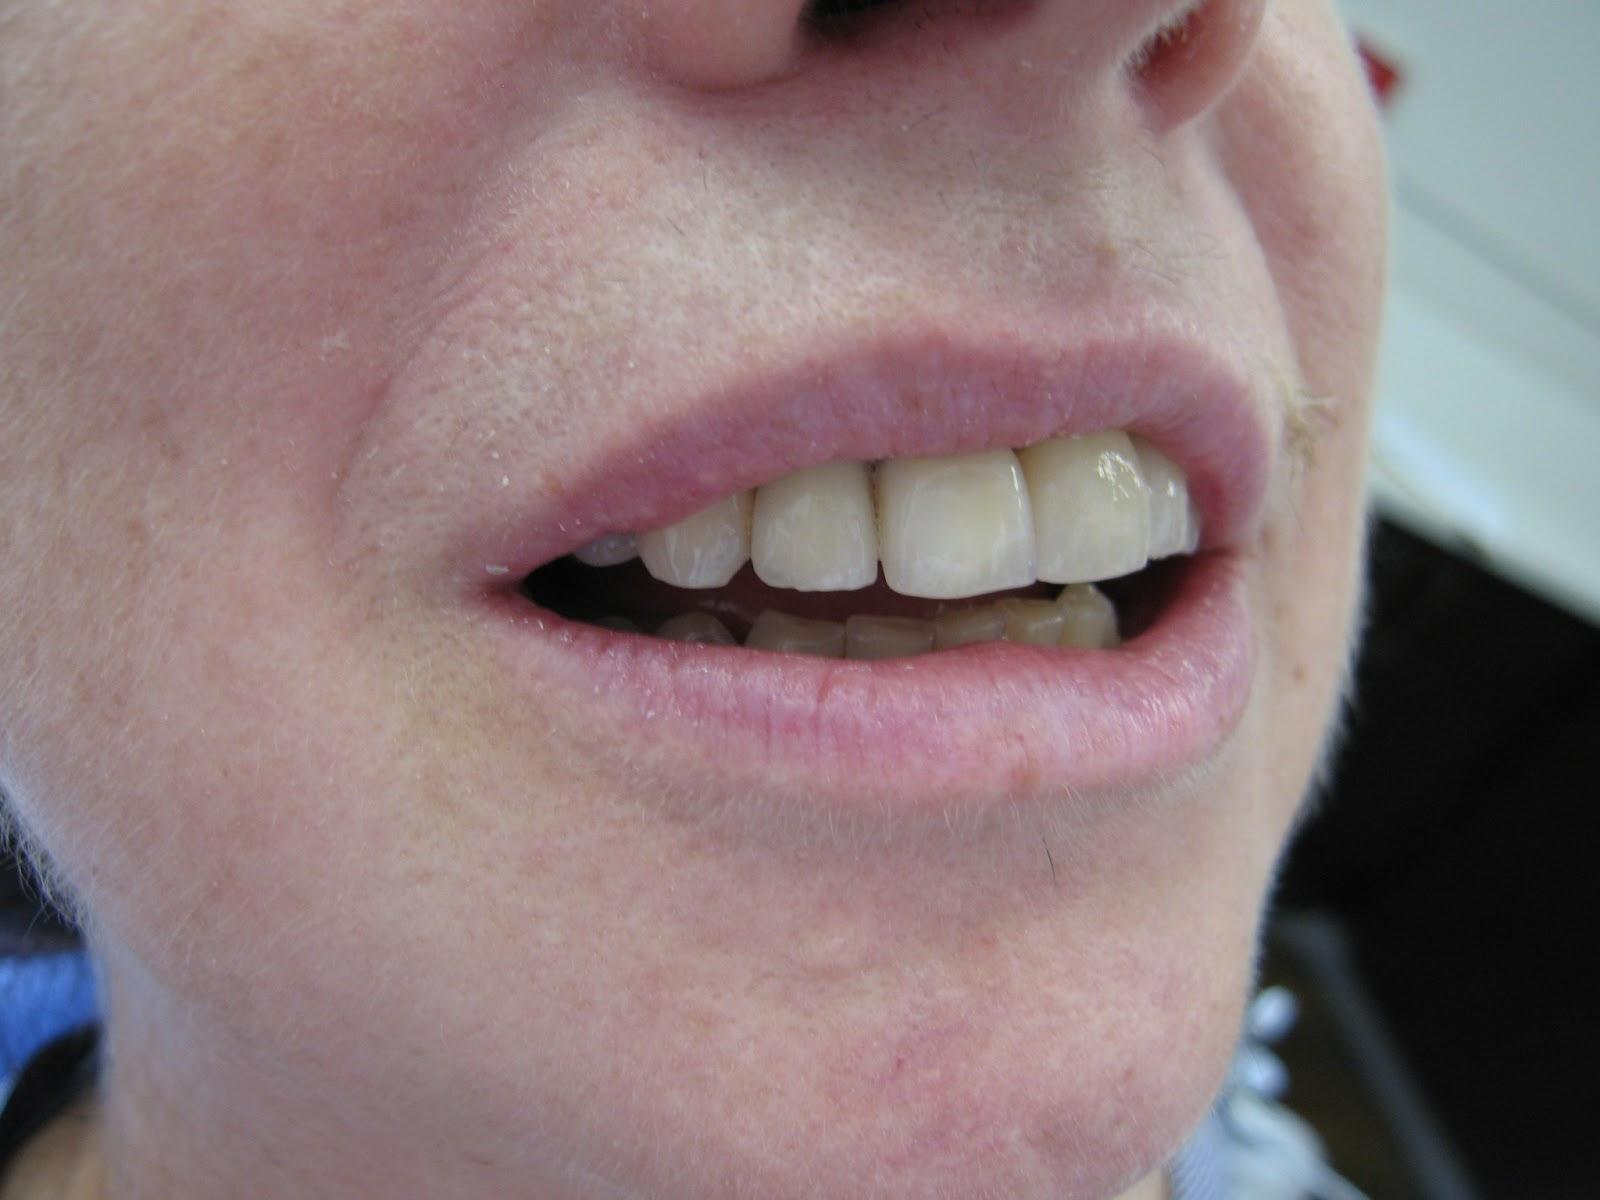 Implant Crown Dental Implants Prosthodontist Dental